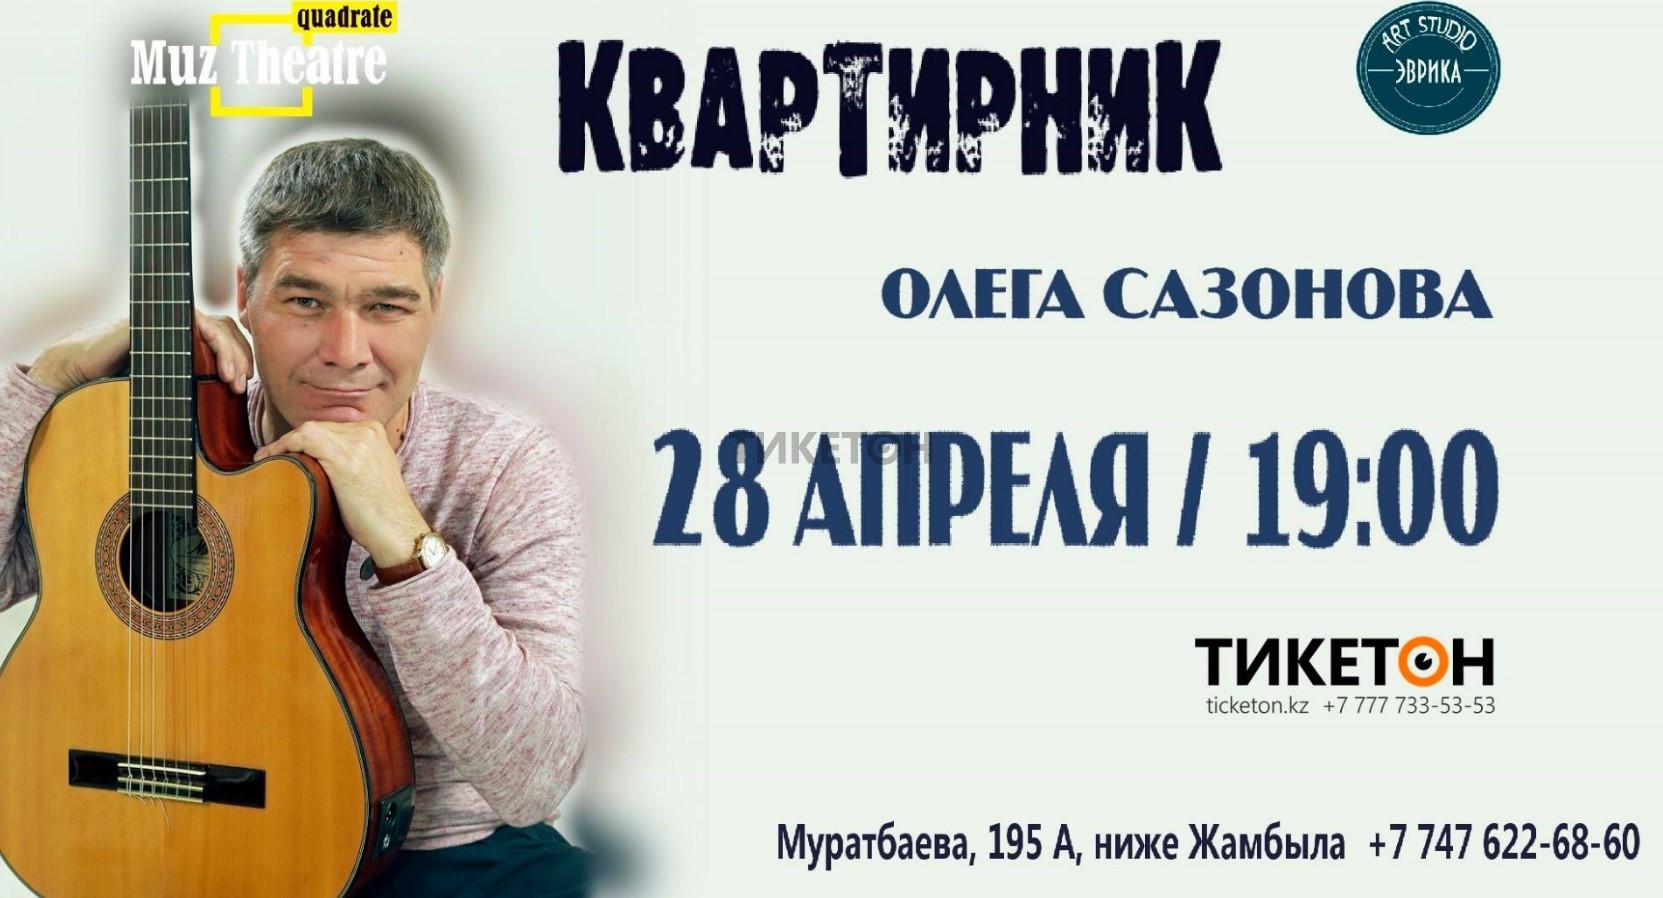 Квартирник Олега Сазонова